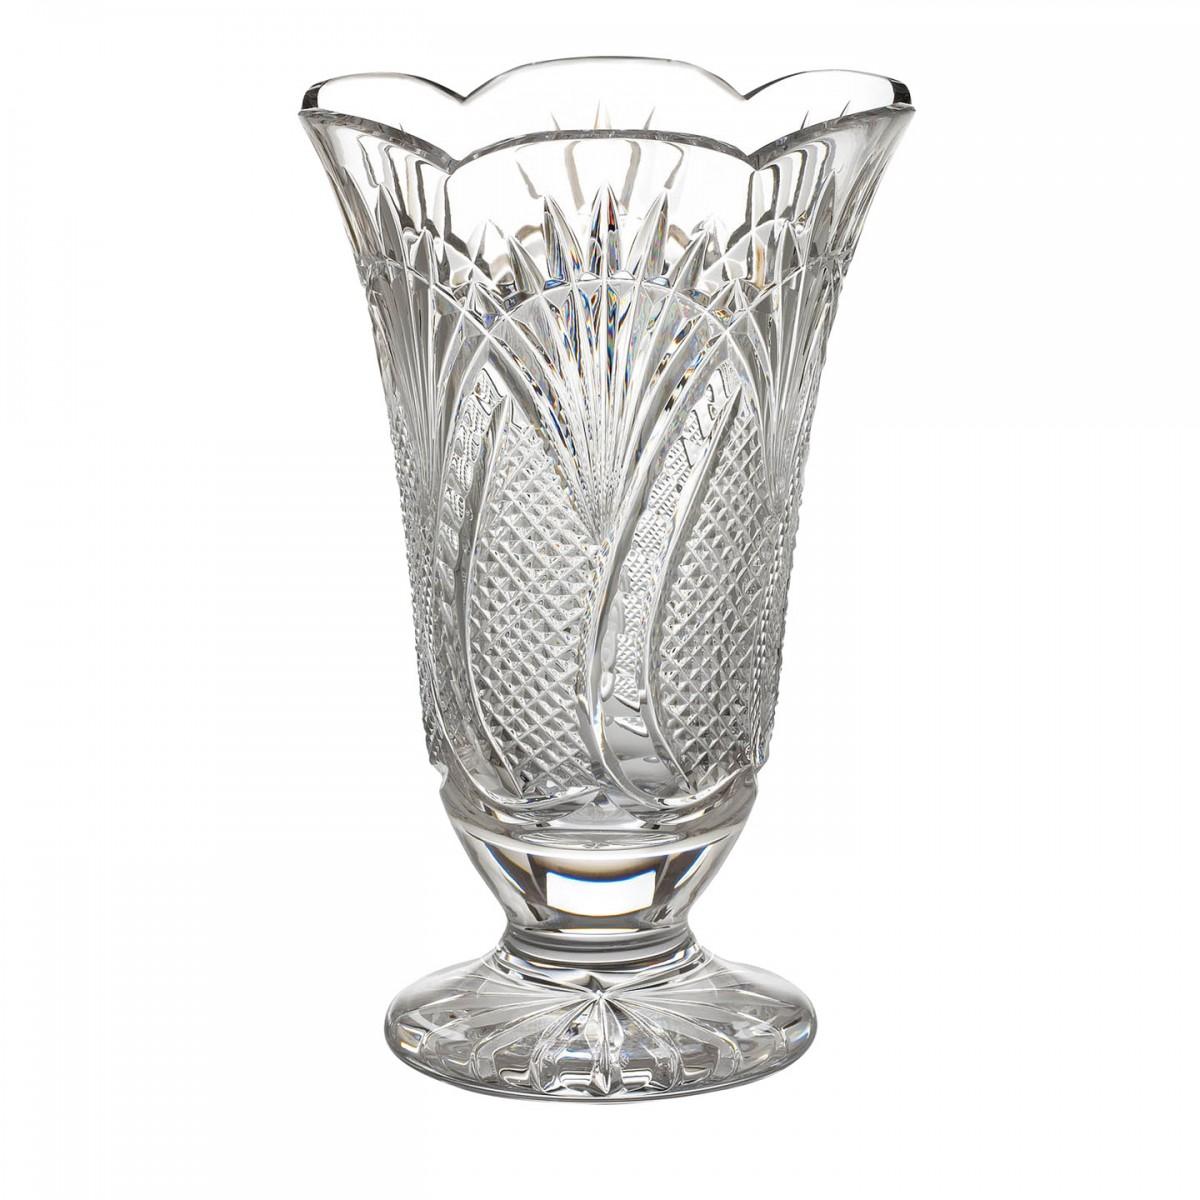 Vases lijo decor waterford crystal seahorse 10 vase reviewsmspy